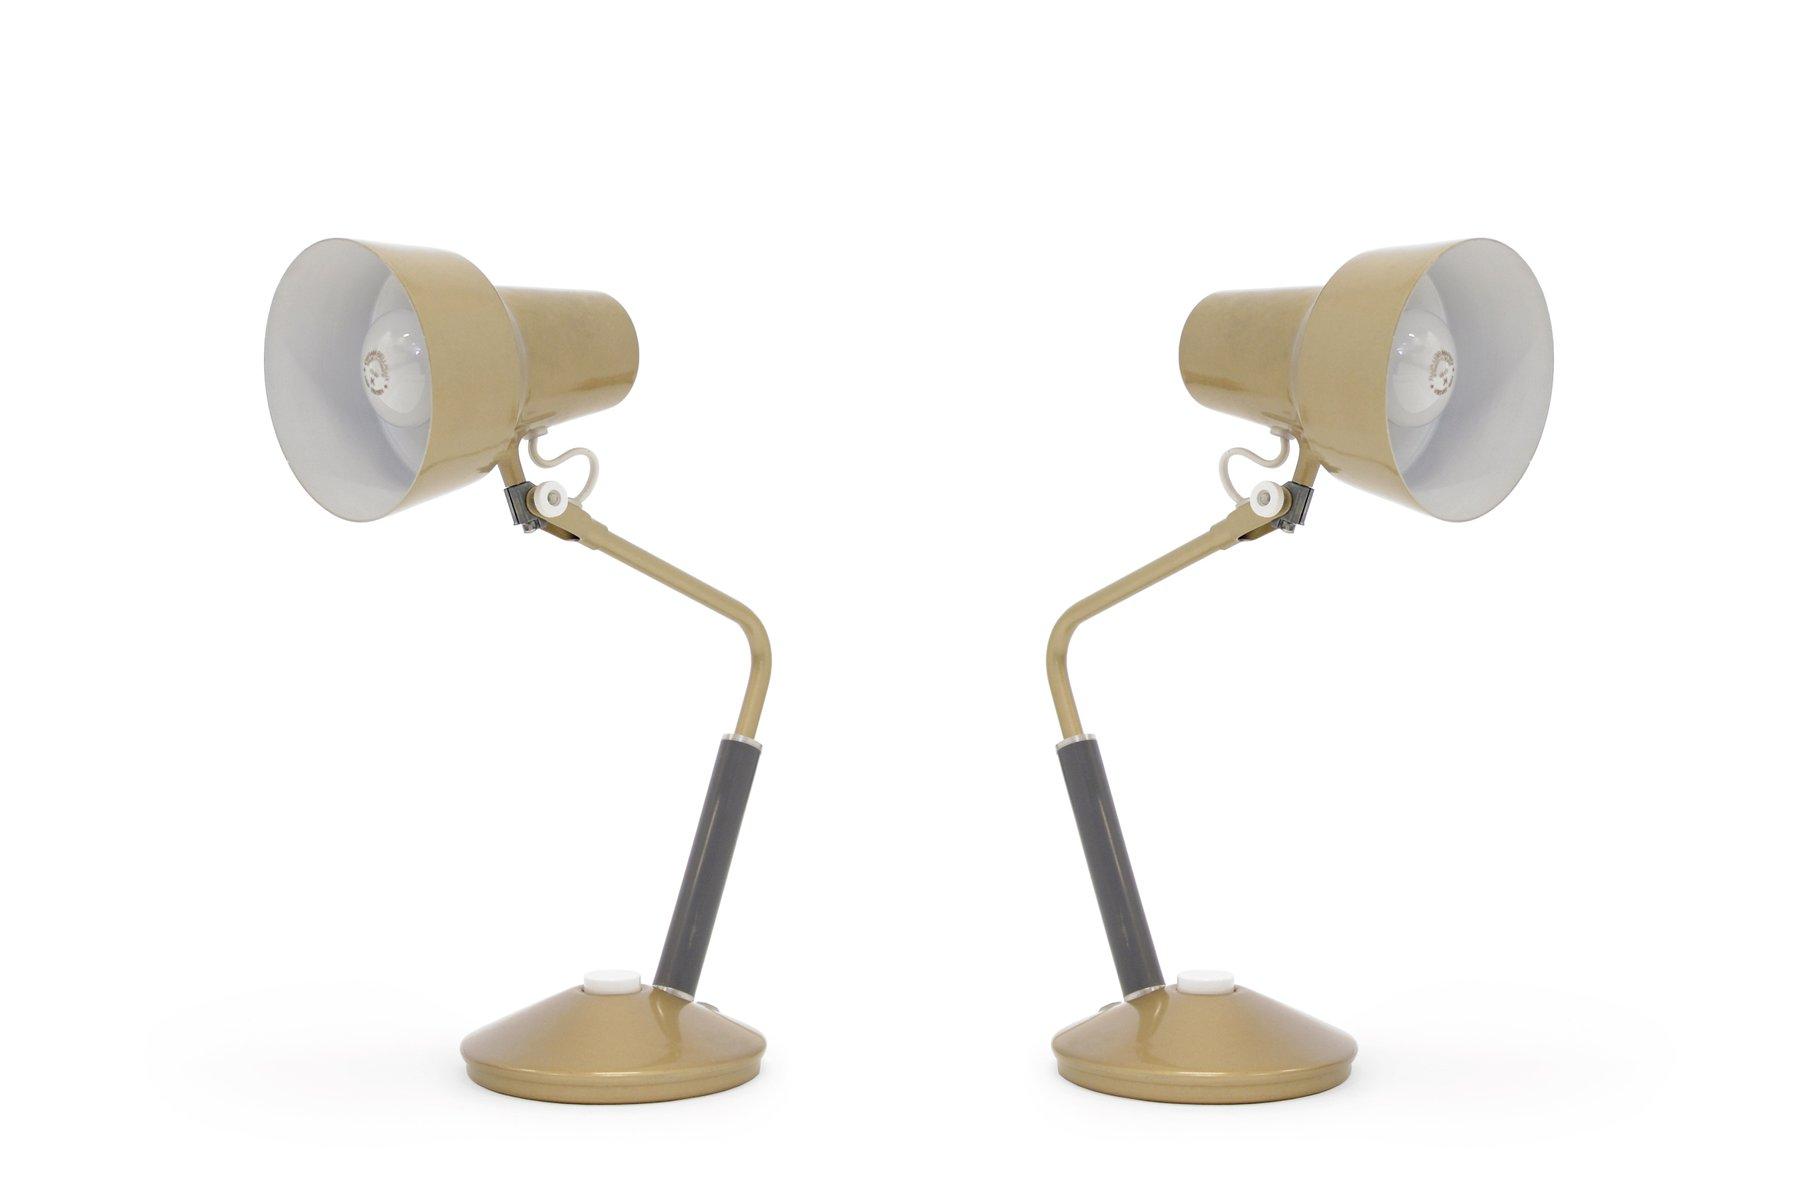 norwegian luxo l table lamps from jac jacobsen s set of   - norwegian luxo l table lamps from jac jacobsen s set of